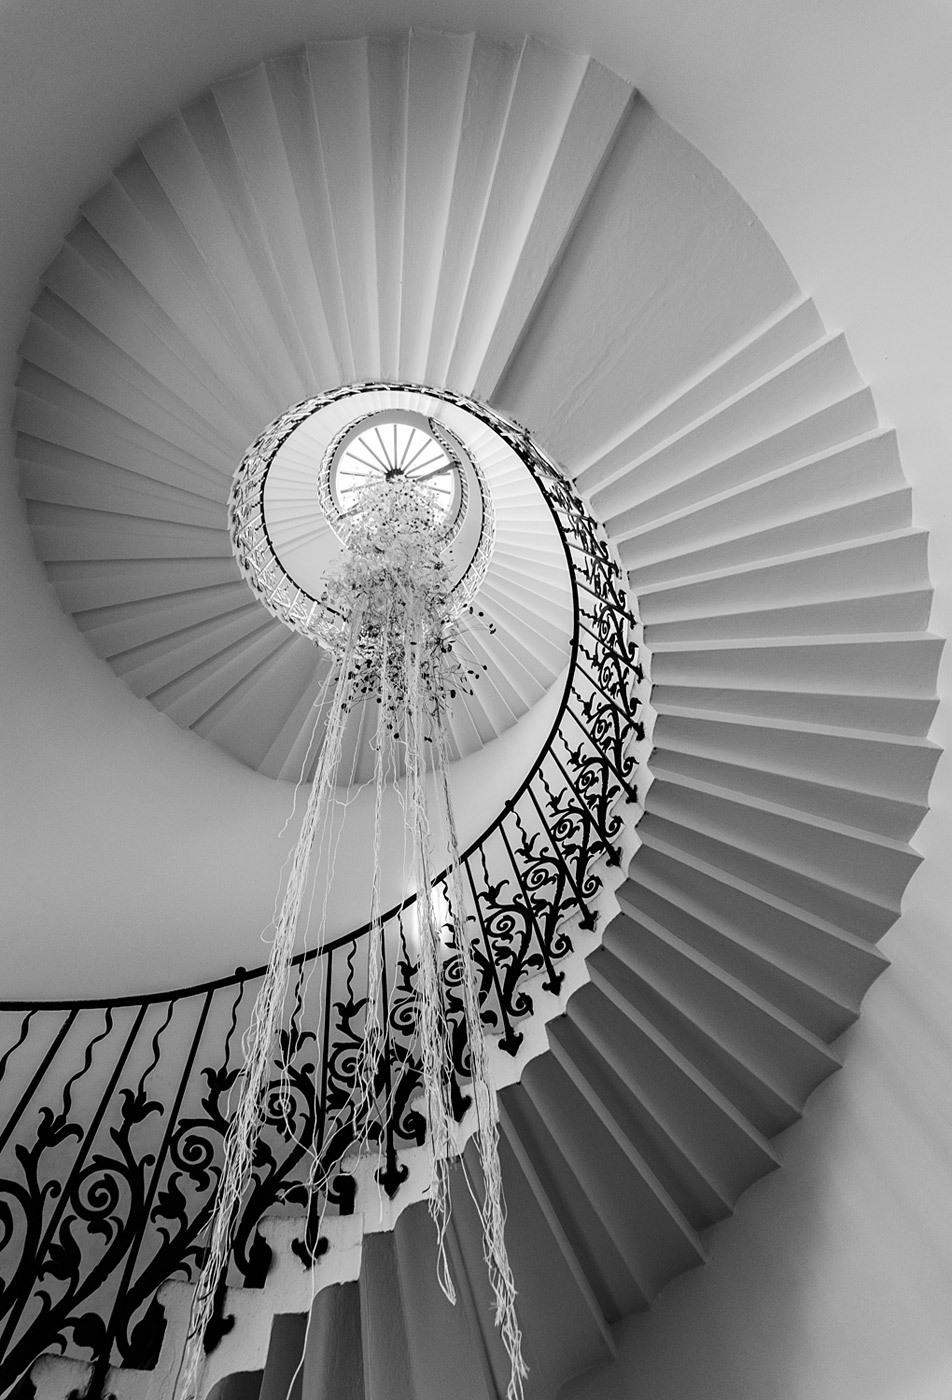 The Tulip Staircase, Queen's House, London. Architect: Inigo Jones. © Edward Neumann / EMCN